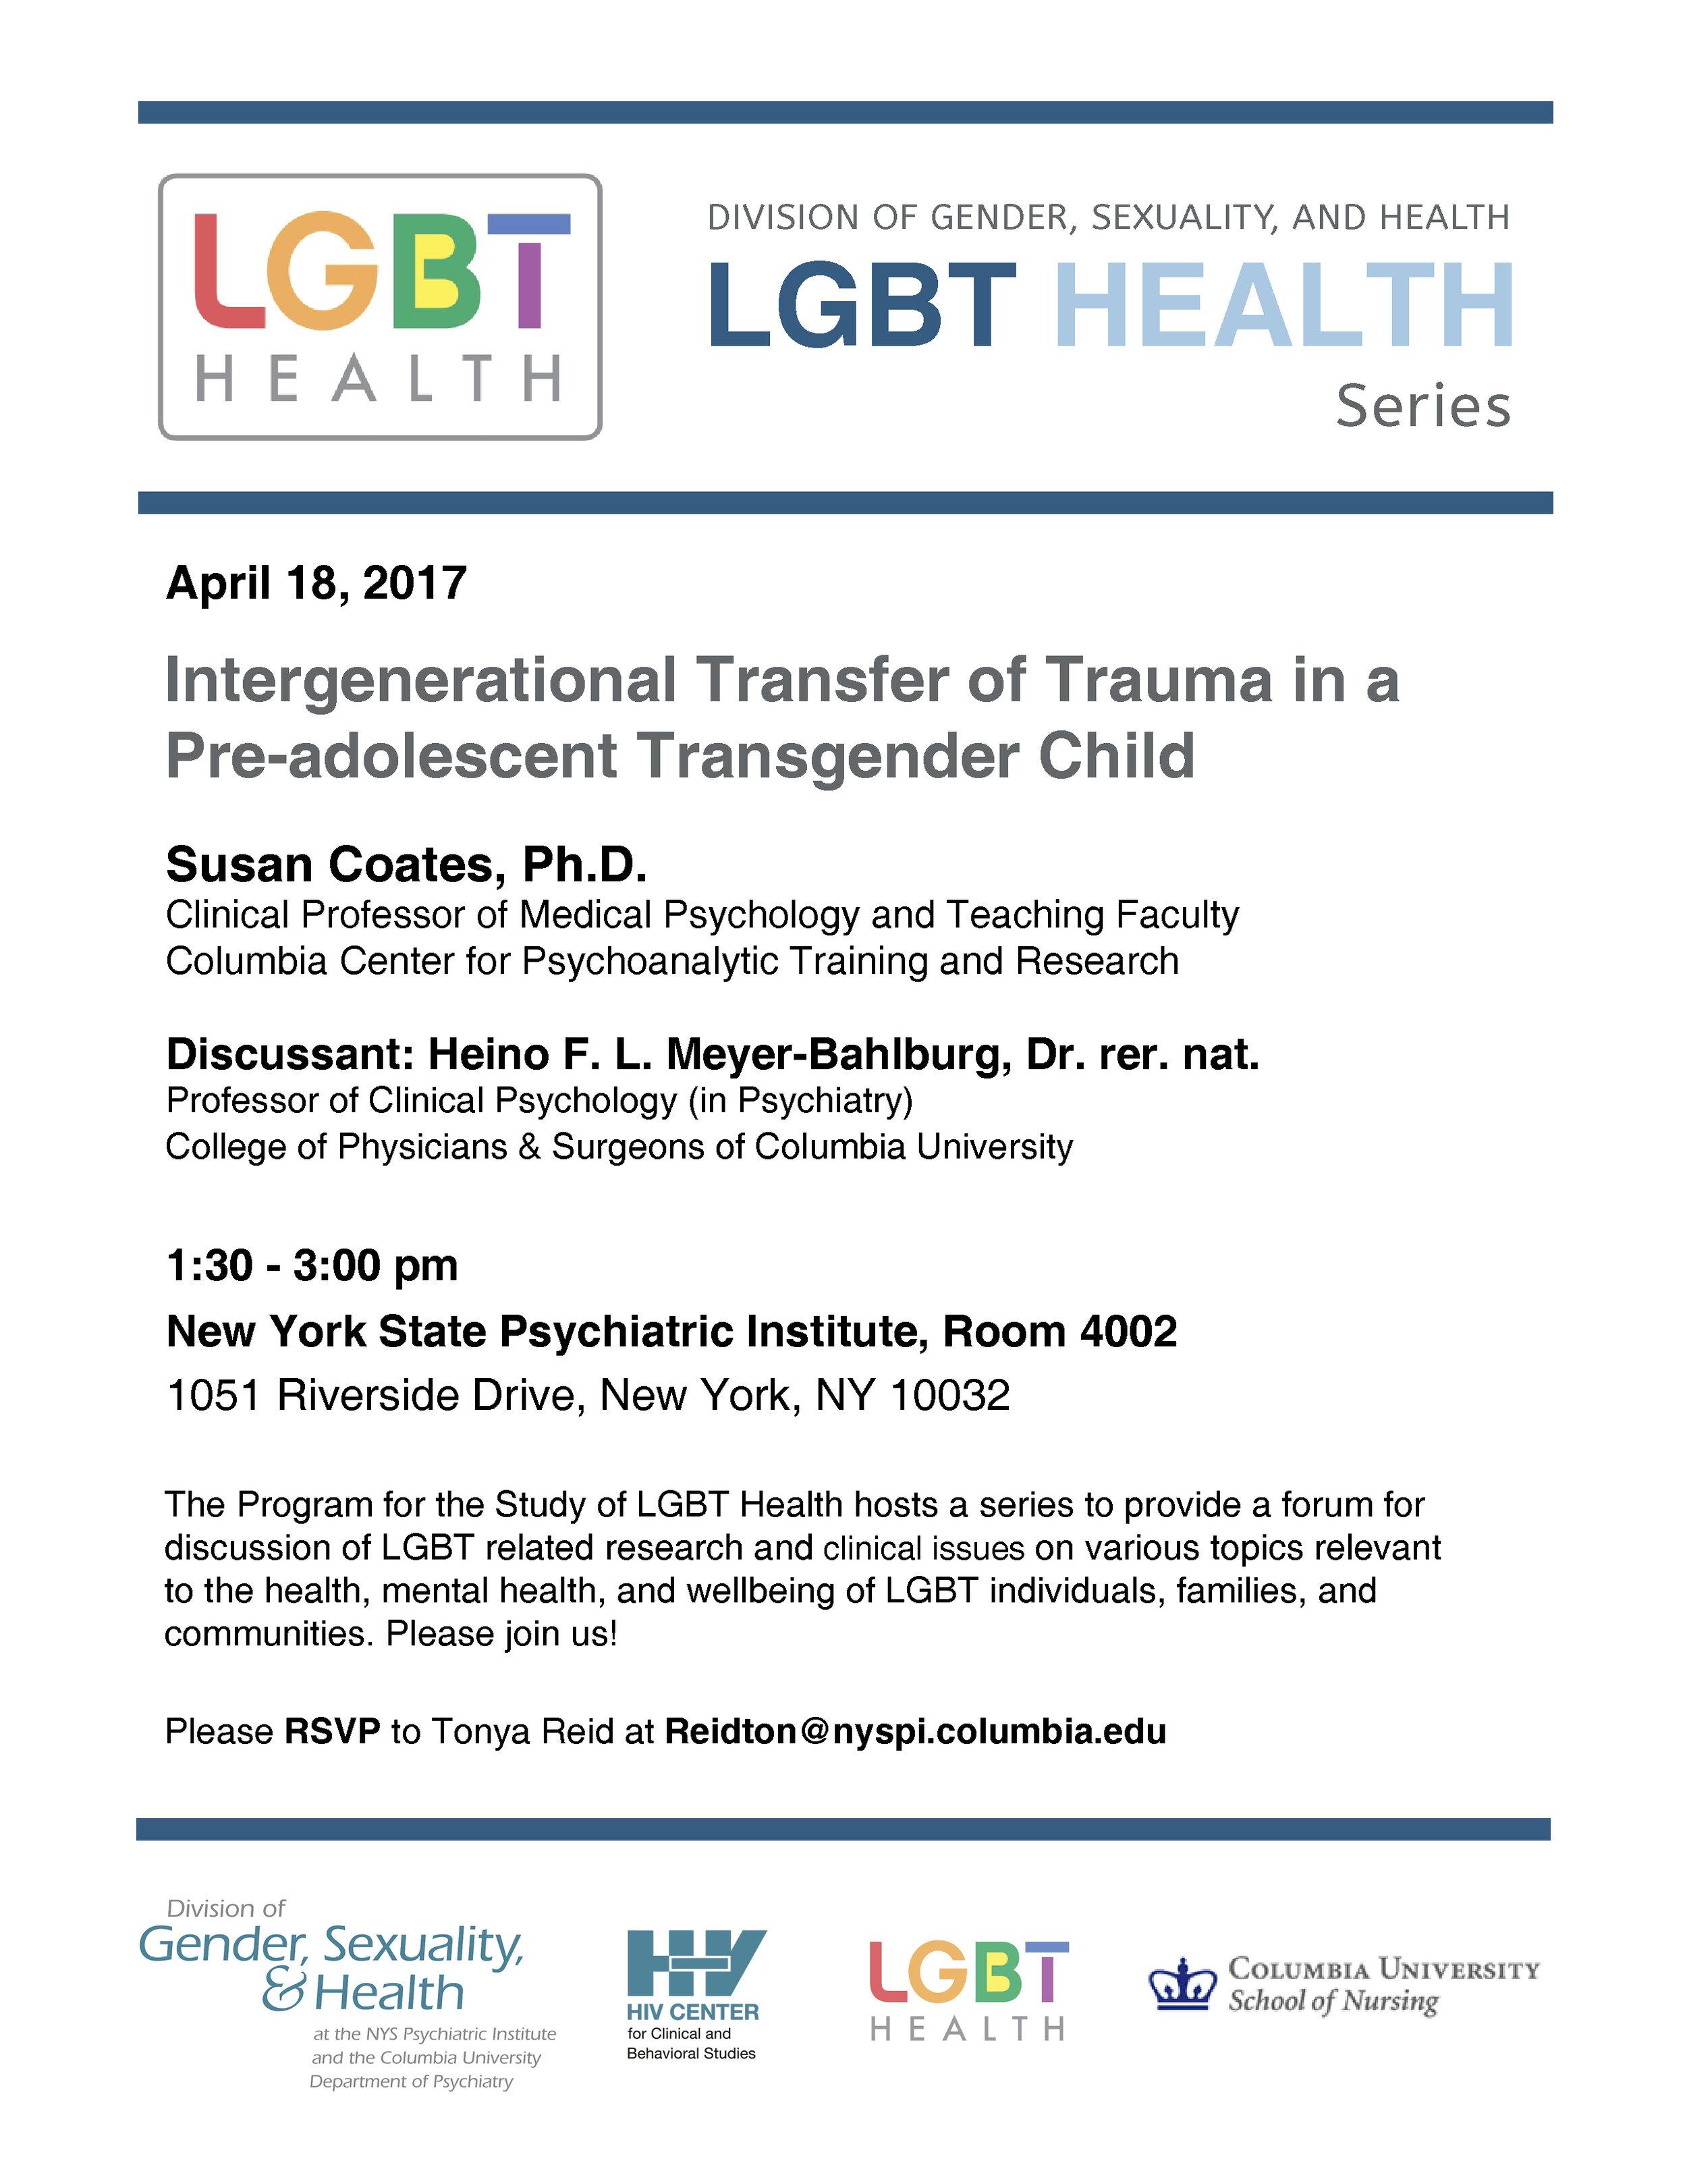 LGBT Health Series April 18 2017.jpg